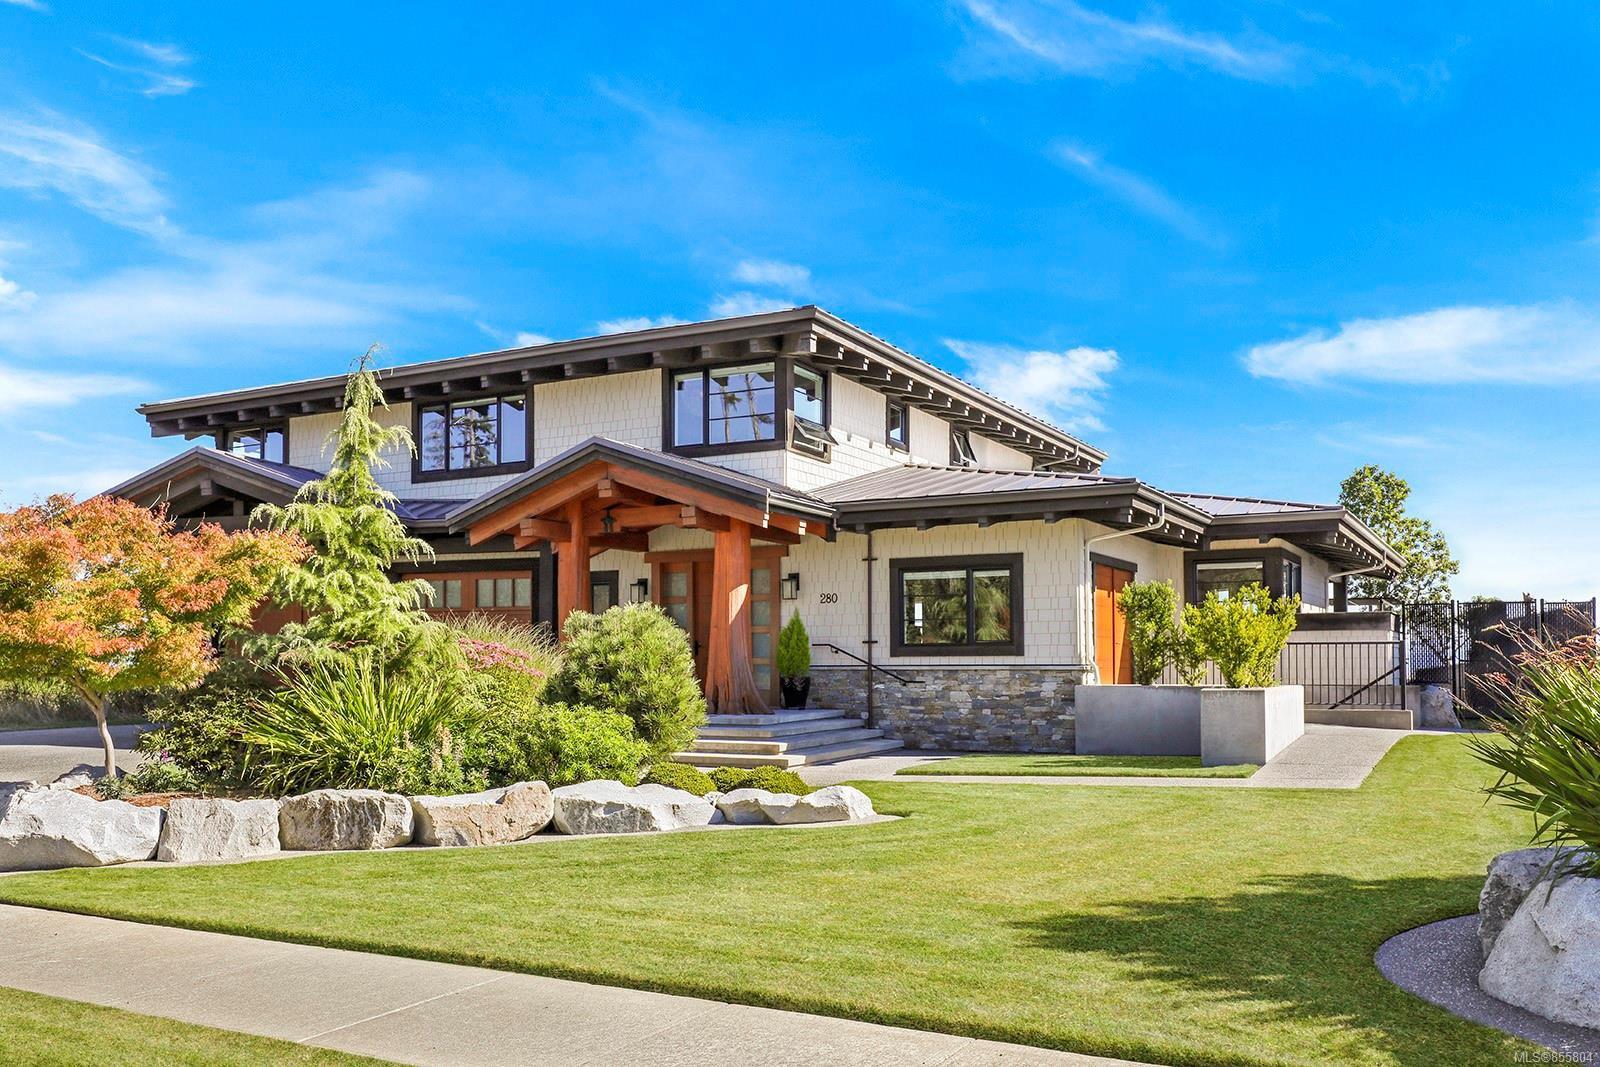 Main Photo: 280 Connemara Rd in : CV Comox Peninsula Single Family Detached for sale (Comox Valley)  : MLS®# 855804